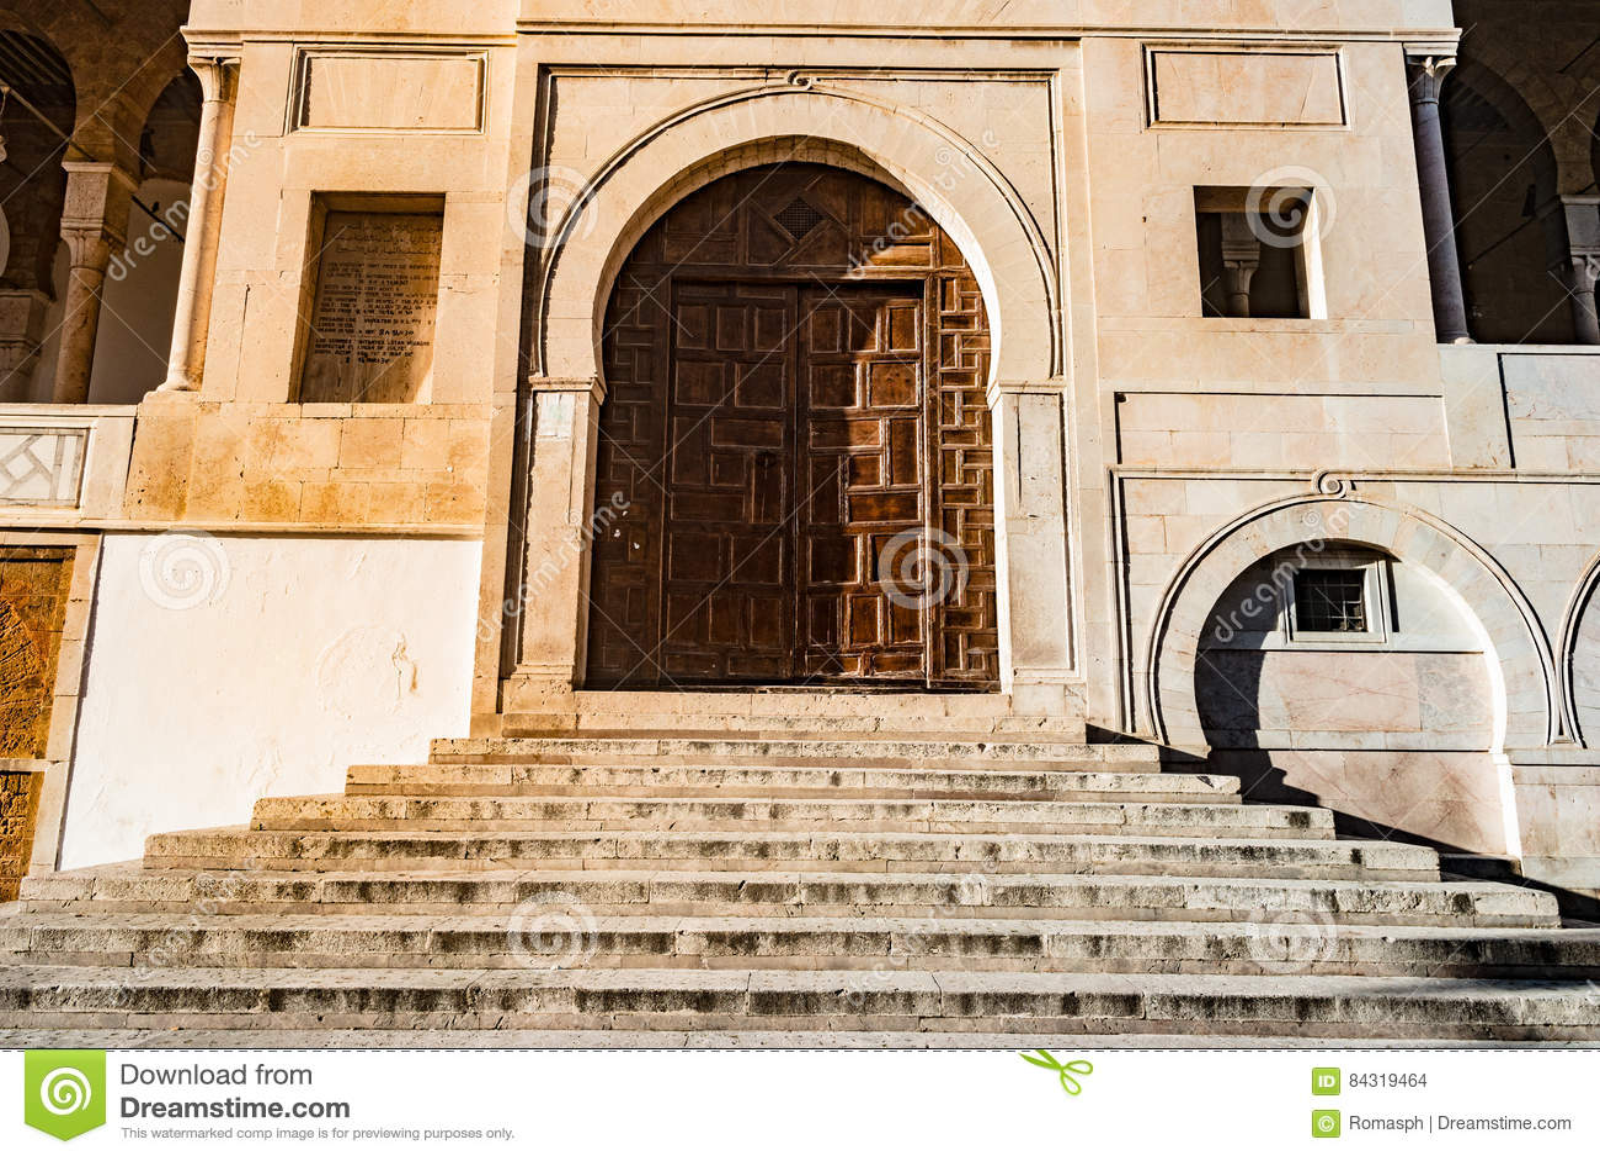 Al Zaytuna Mosque In Tunis Tunisia Stock Photo Image Of House East 84319464